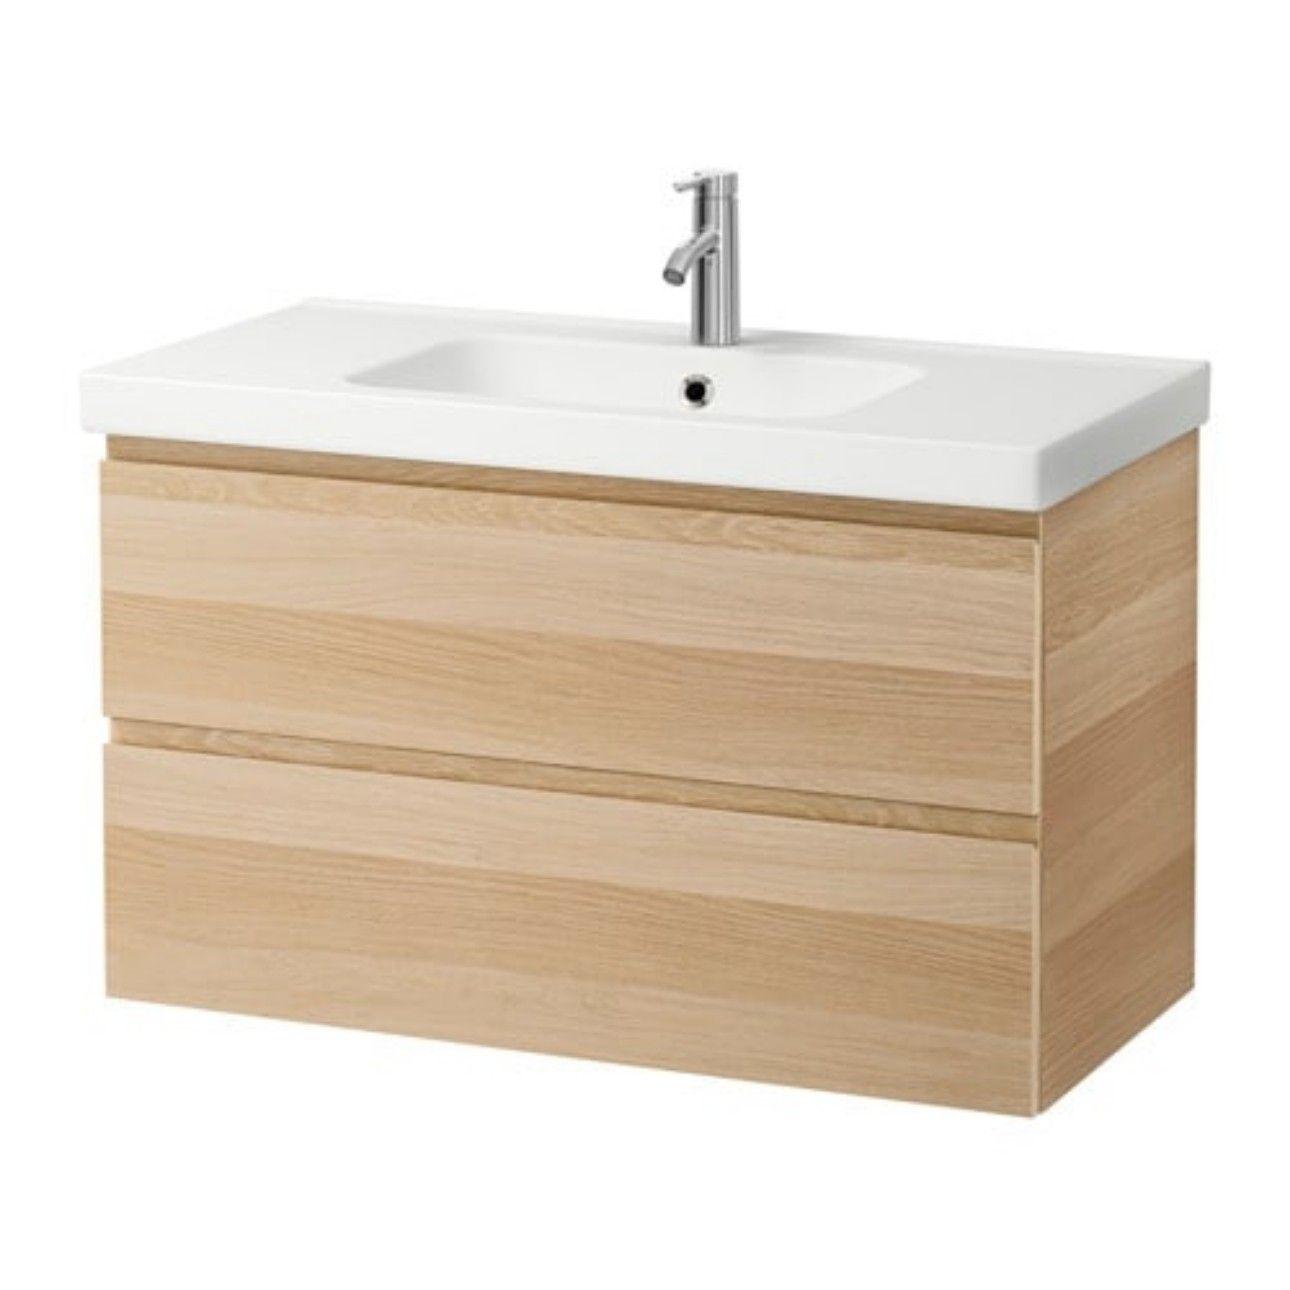 Pin de Sergitin C I en Baño niños ikea   Muebles de baño ...